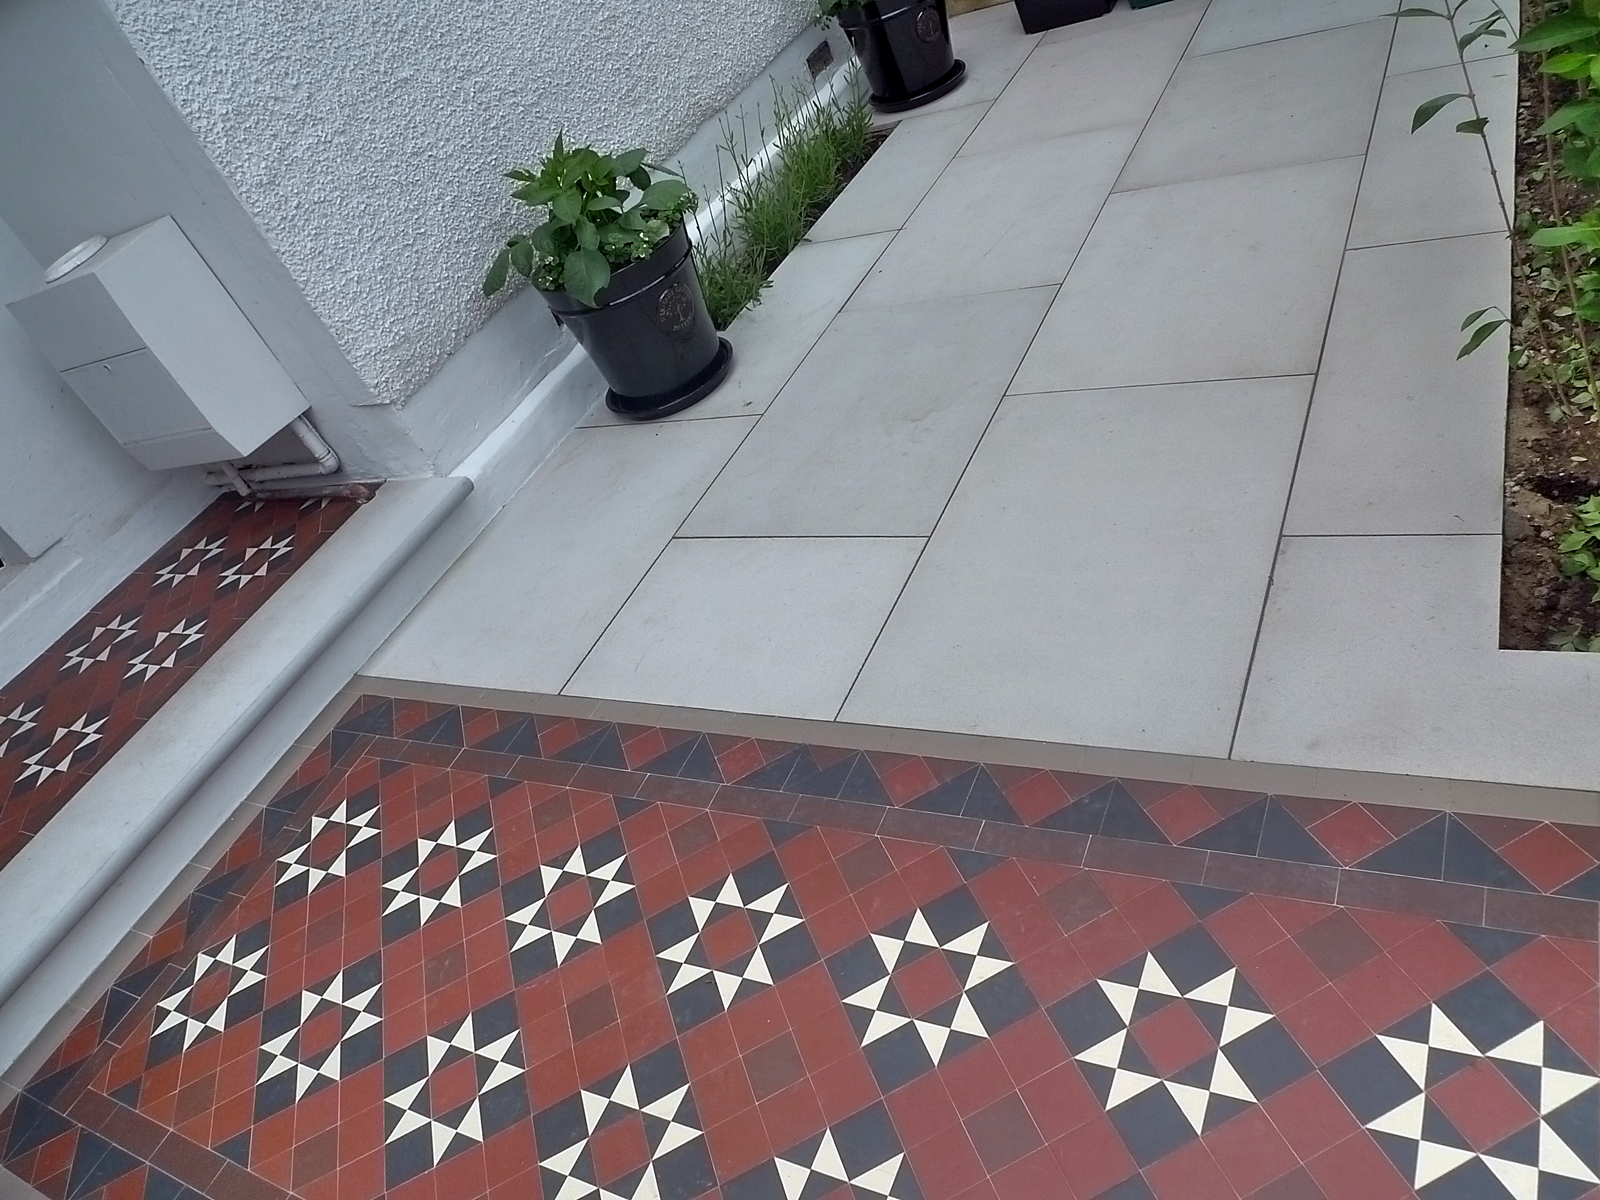 victorian mosaic tile path battersea clapham cheam kensington tooting streatham london